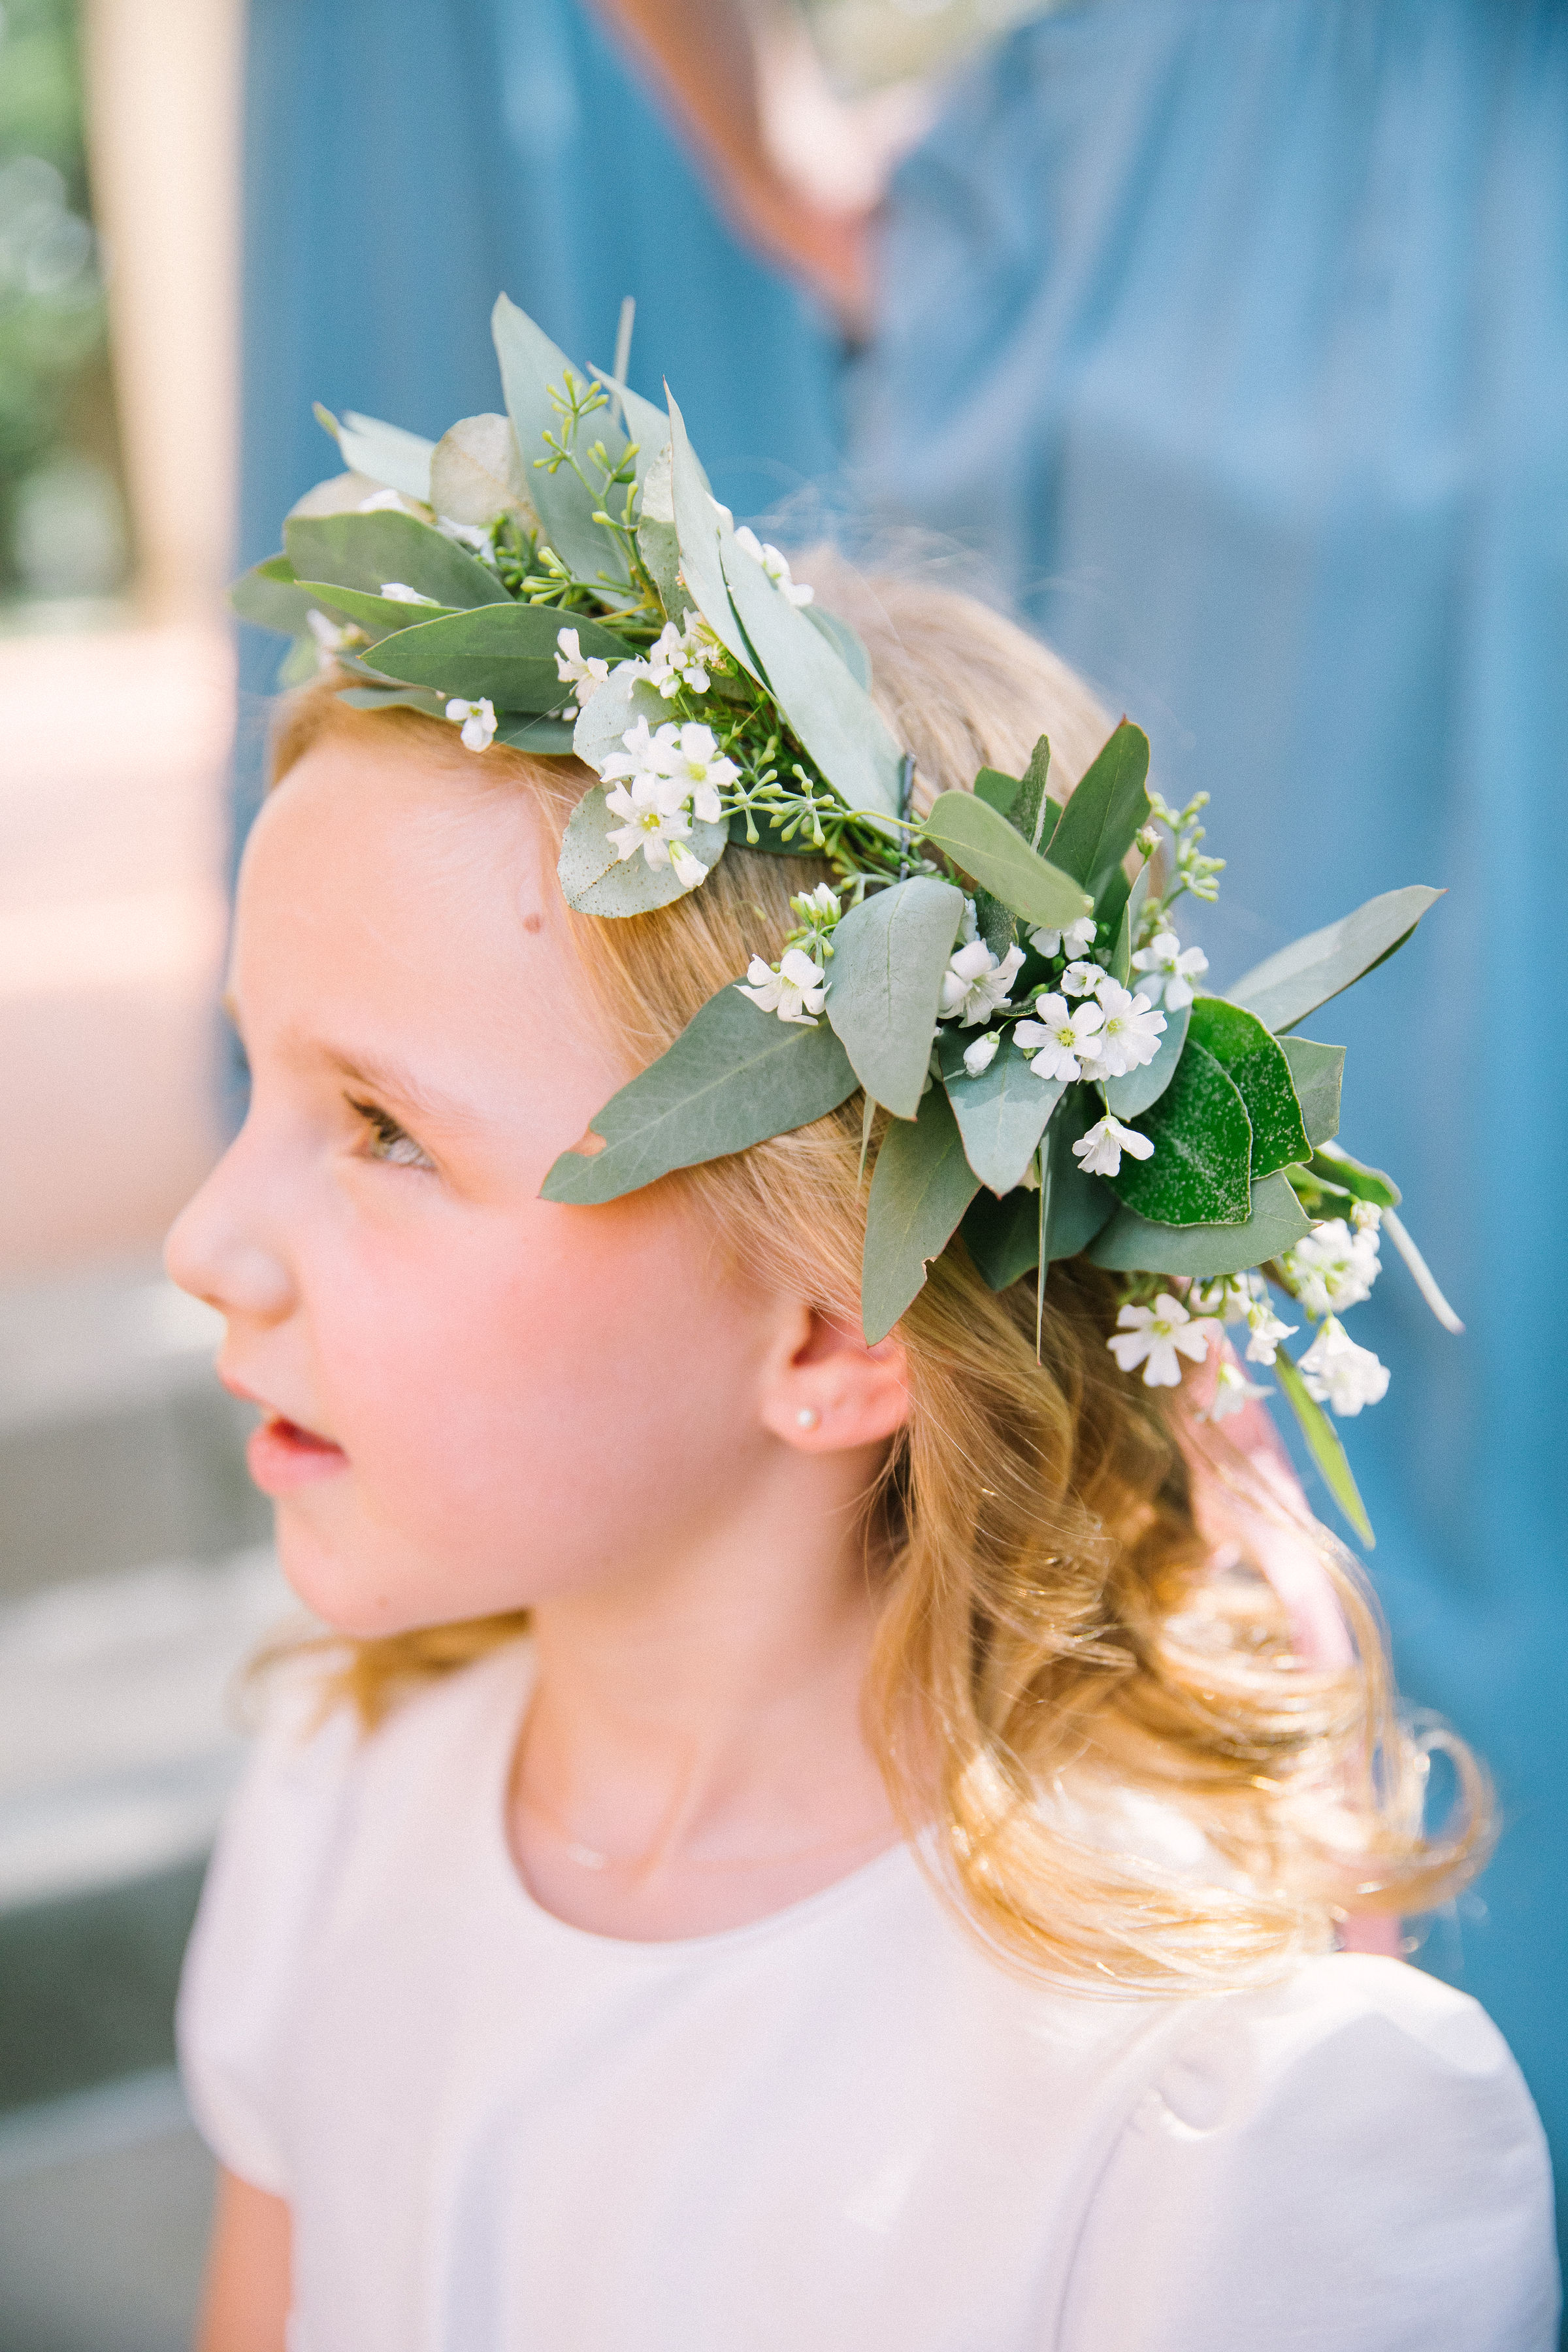 Ellen-Ashton-Photography-Girt-and-gold-events-weddings-Ashton-Depot-Weddings154.jpg